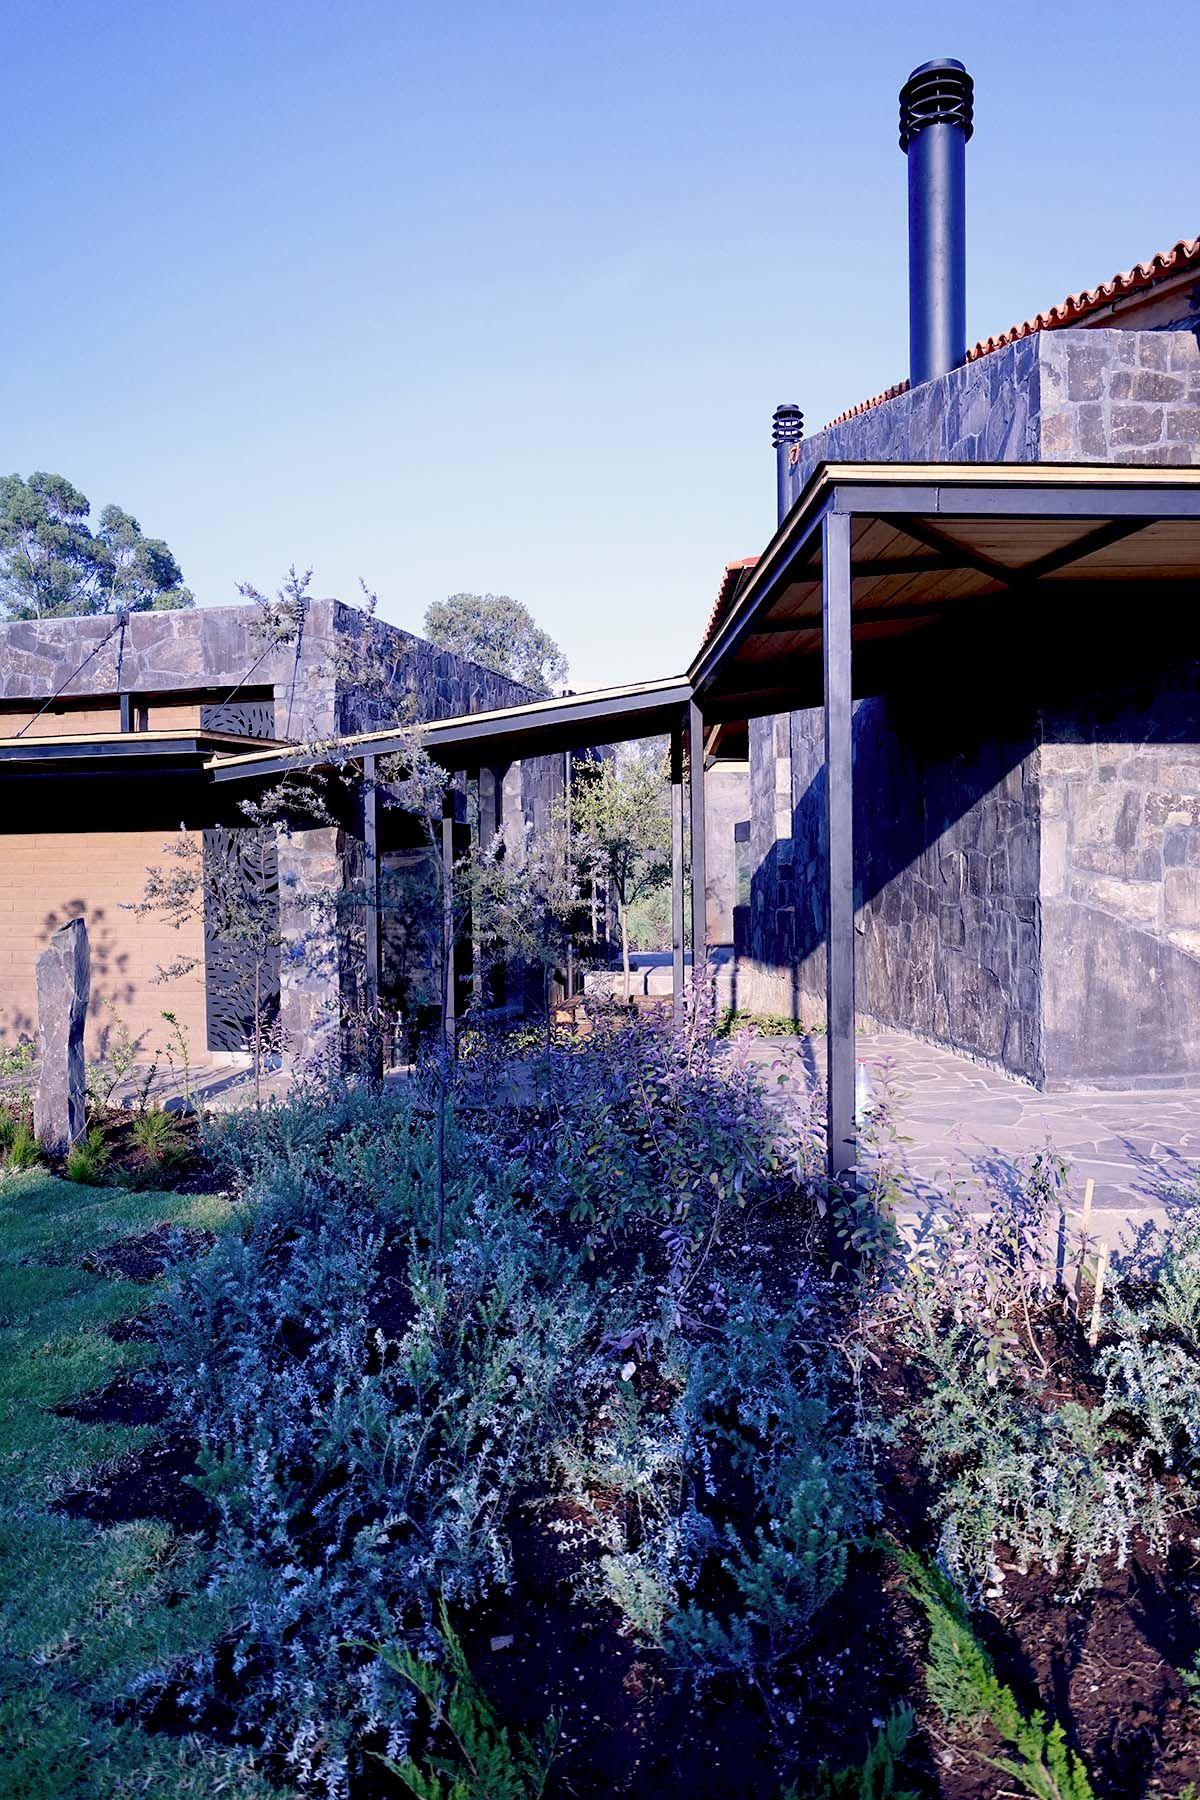 La Casona / Patio Intermedio / @ArqLDSalazar - PARQ Progresivo de Arquitectura